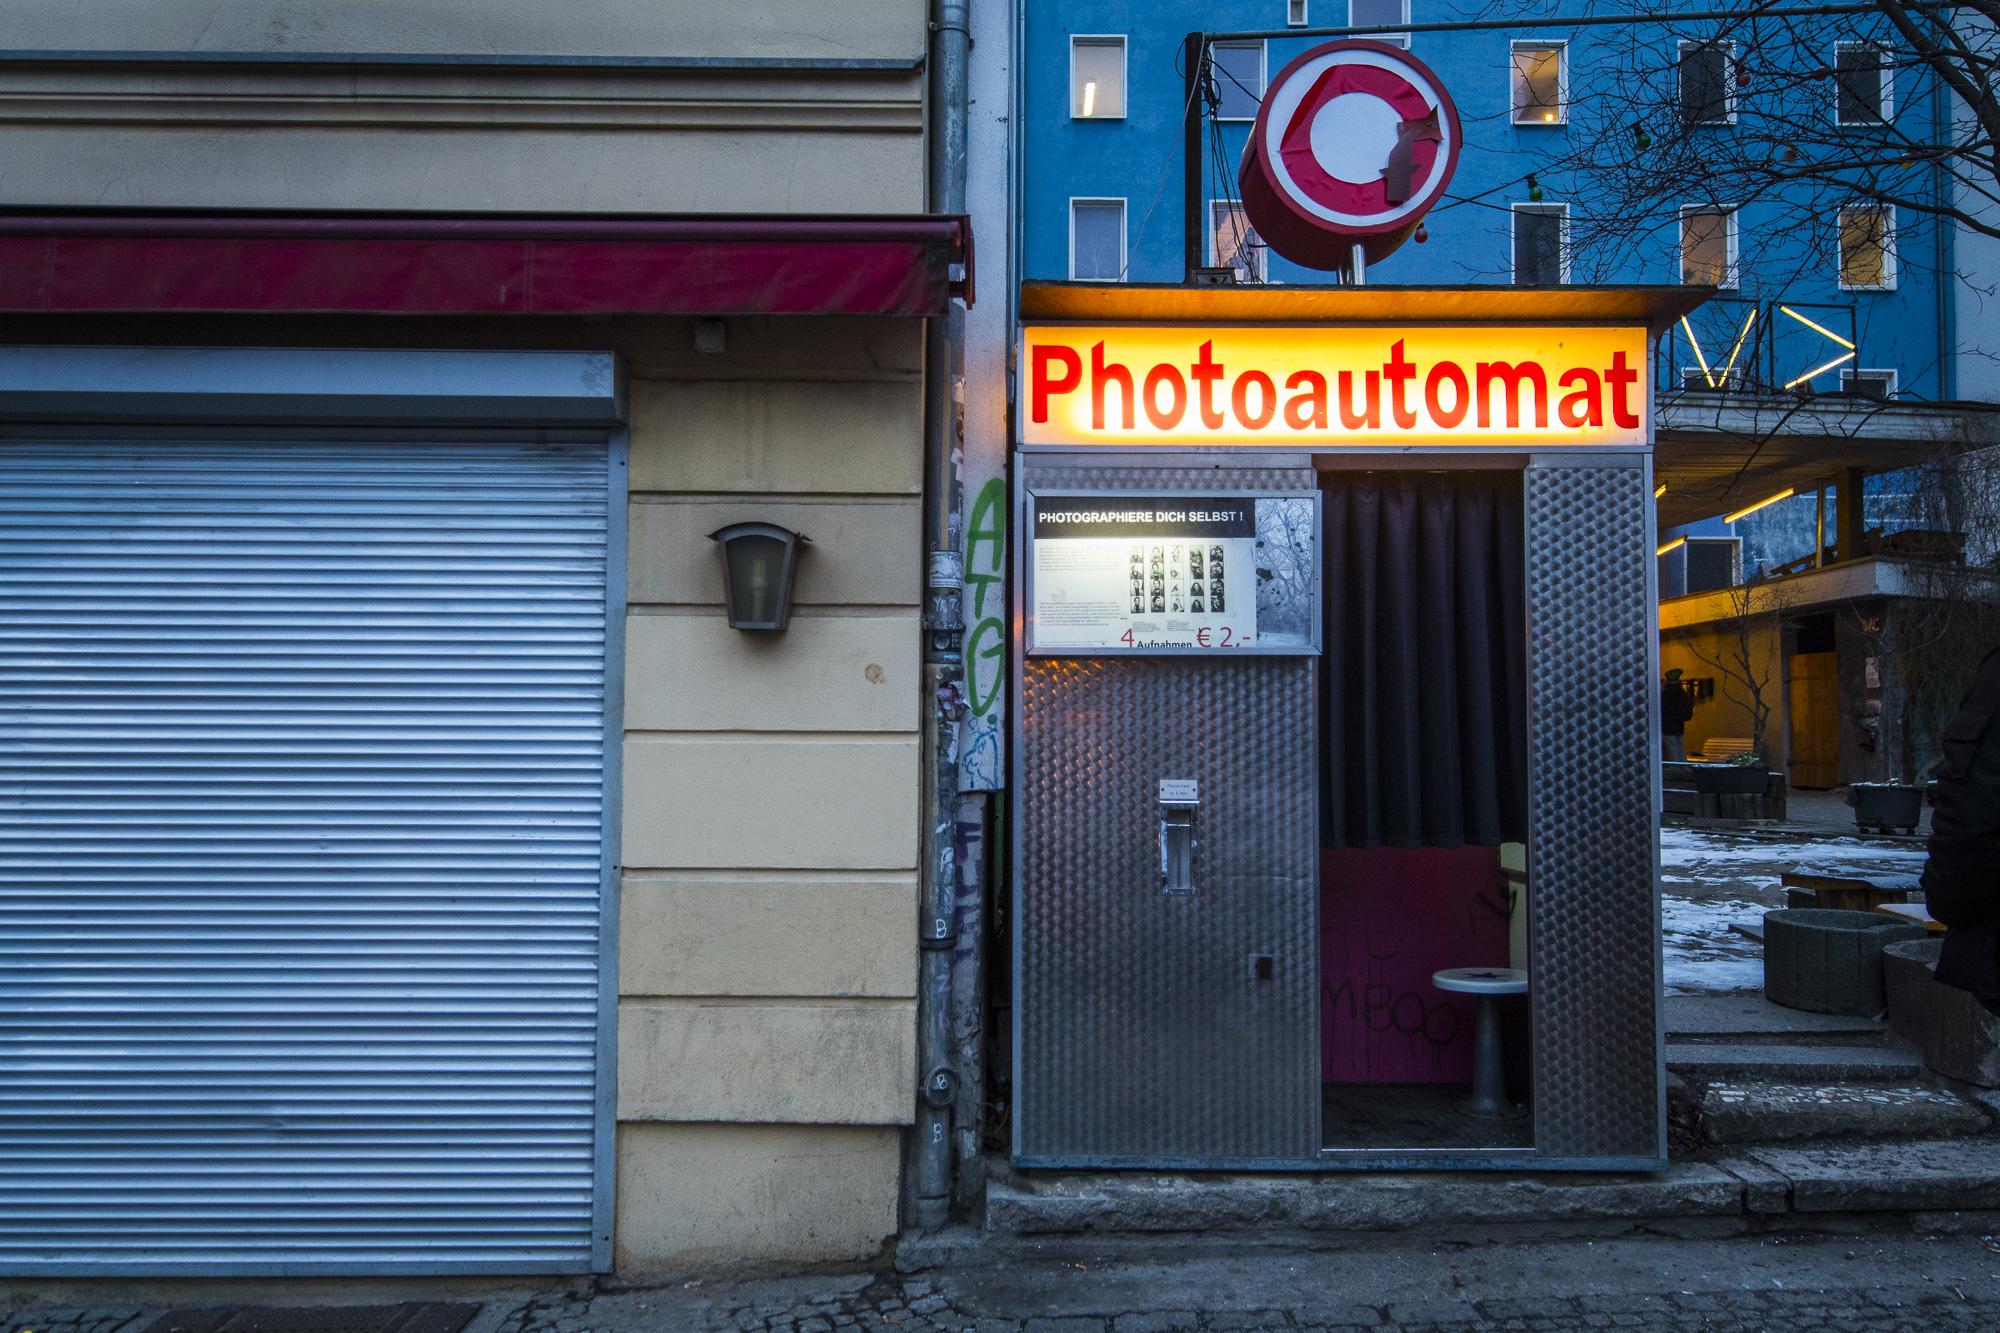 Veteranenstraße 21  PHOTOGRAPHY: ALEXANDER J.E. BRADLEY • NIKON D500 • AF-S NIKKOR 14-24MM F/2.8G ED @ 16MM • F/2.8 • 1/125 • ISO 800